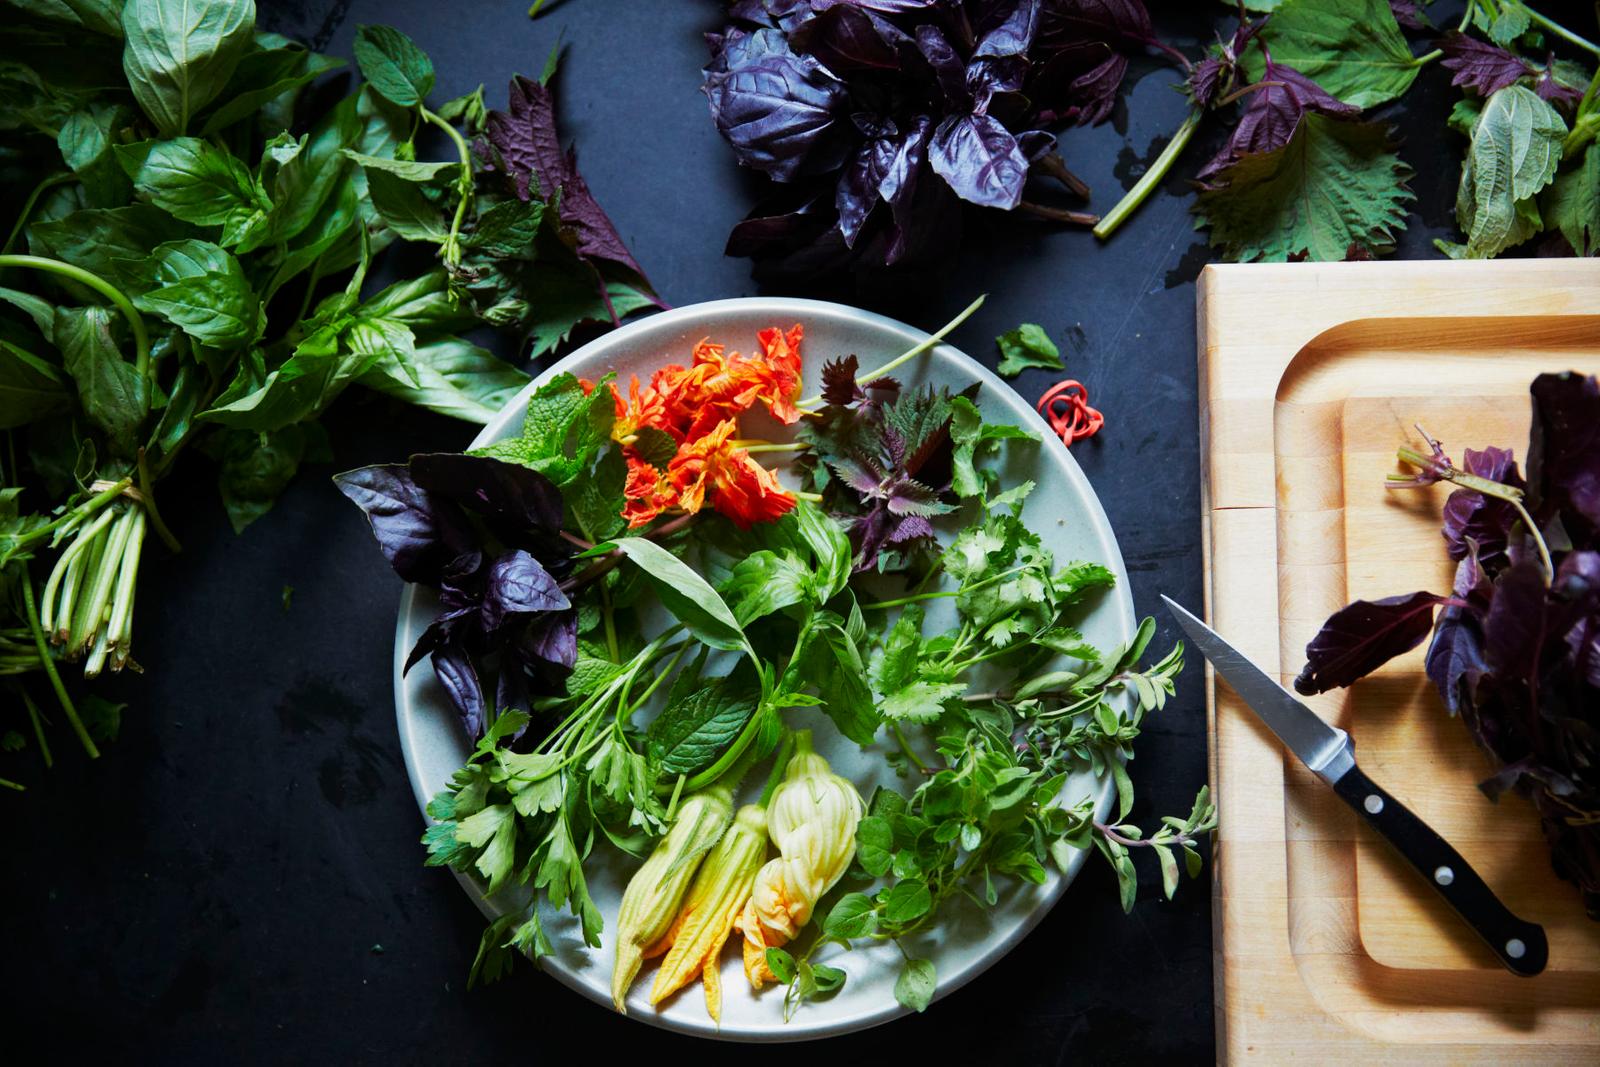 Raw Herbs   Ingredients Beauty A130709 Root to Leaf Stephen Satterfield Cookbook 2013